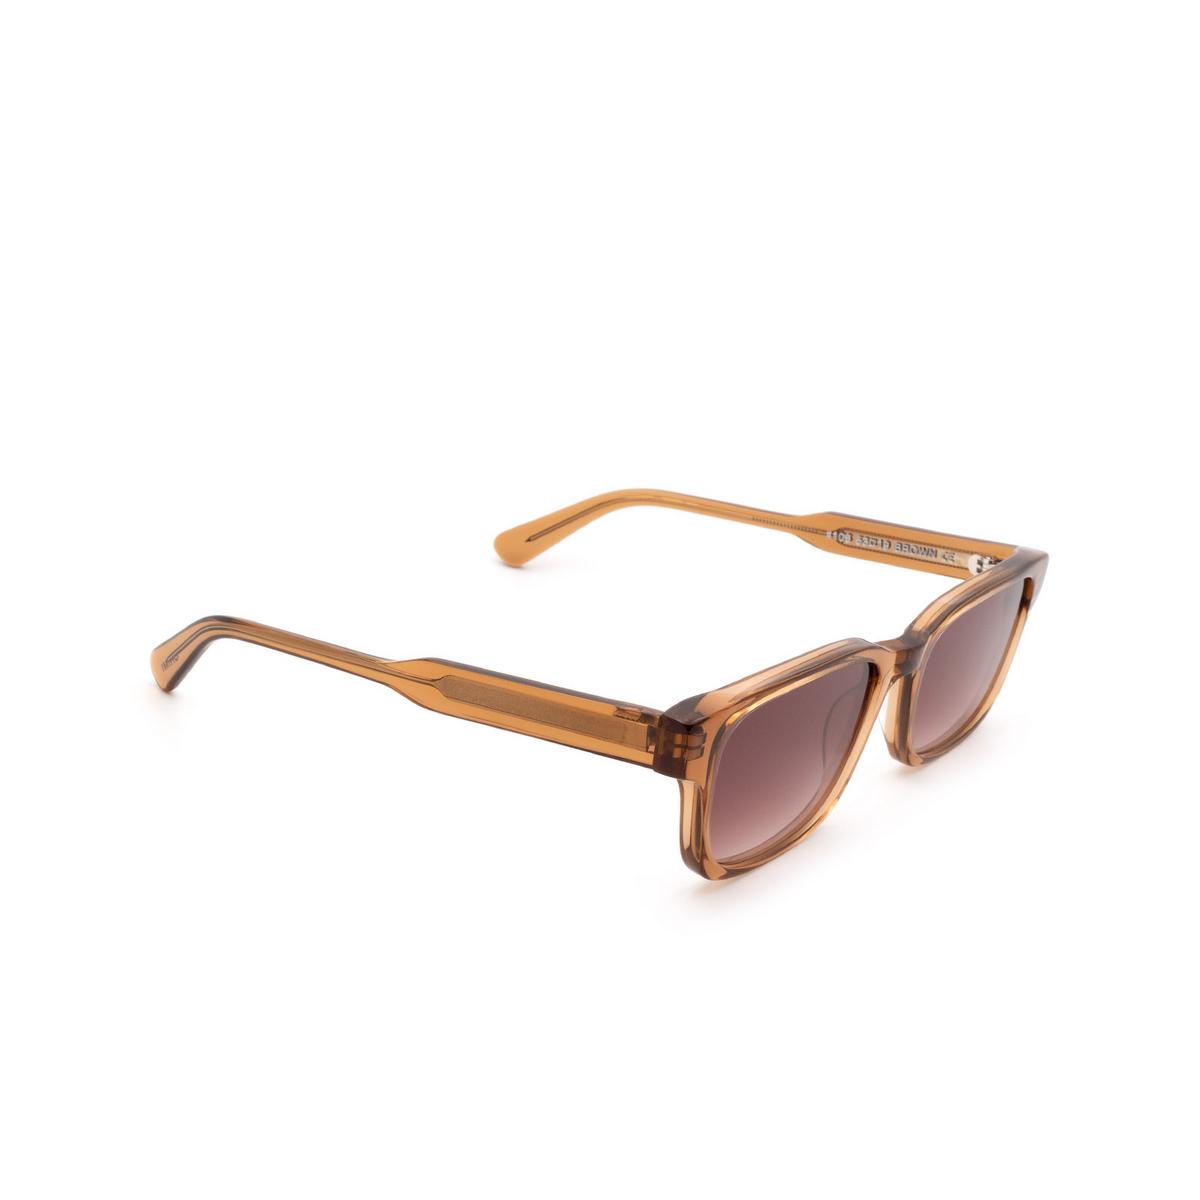 Chimi® Rectangle Sunglasses: #106 color Brown Cinnamon Brown - three-quarters view.